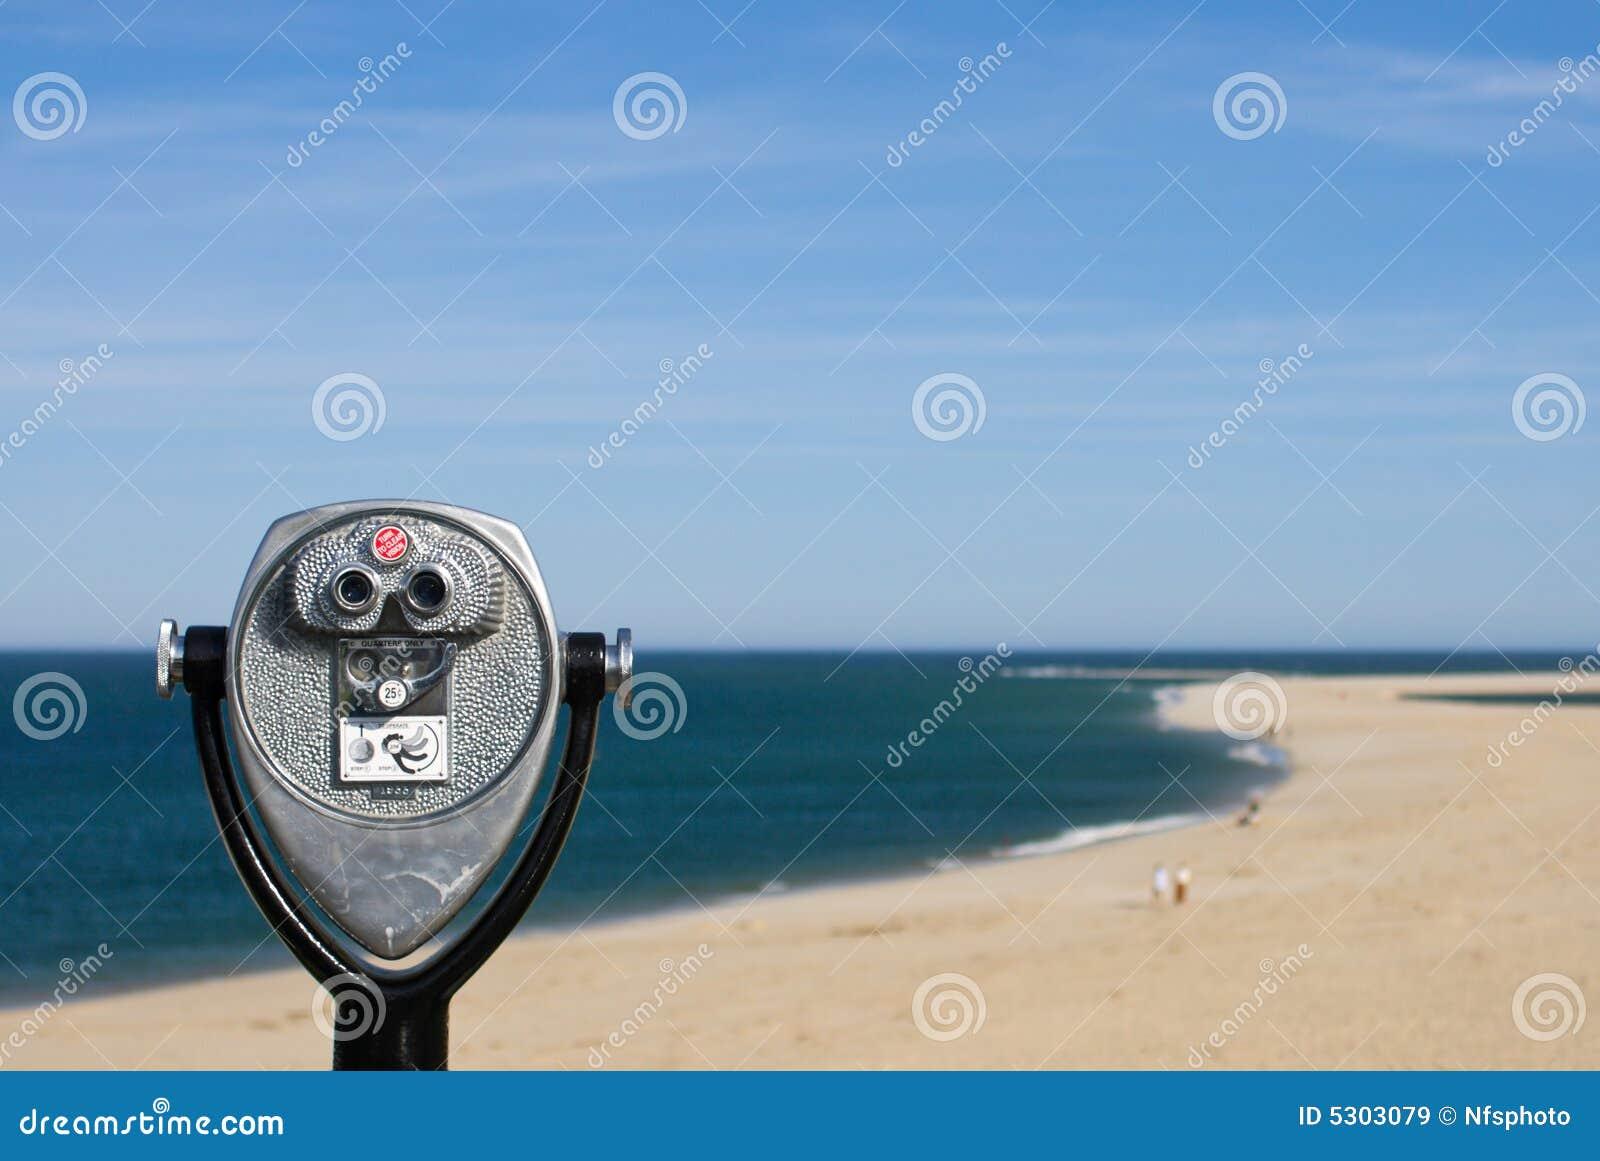 Münzenbinokel für Strandbeobachtung